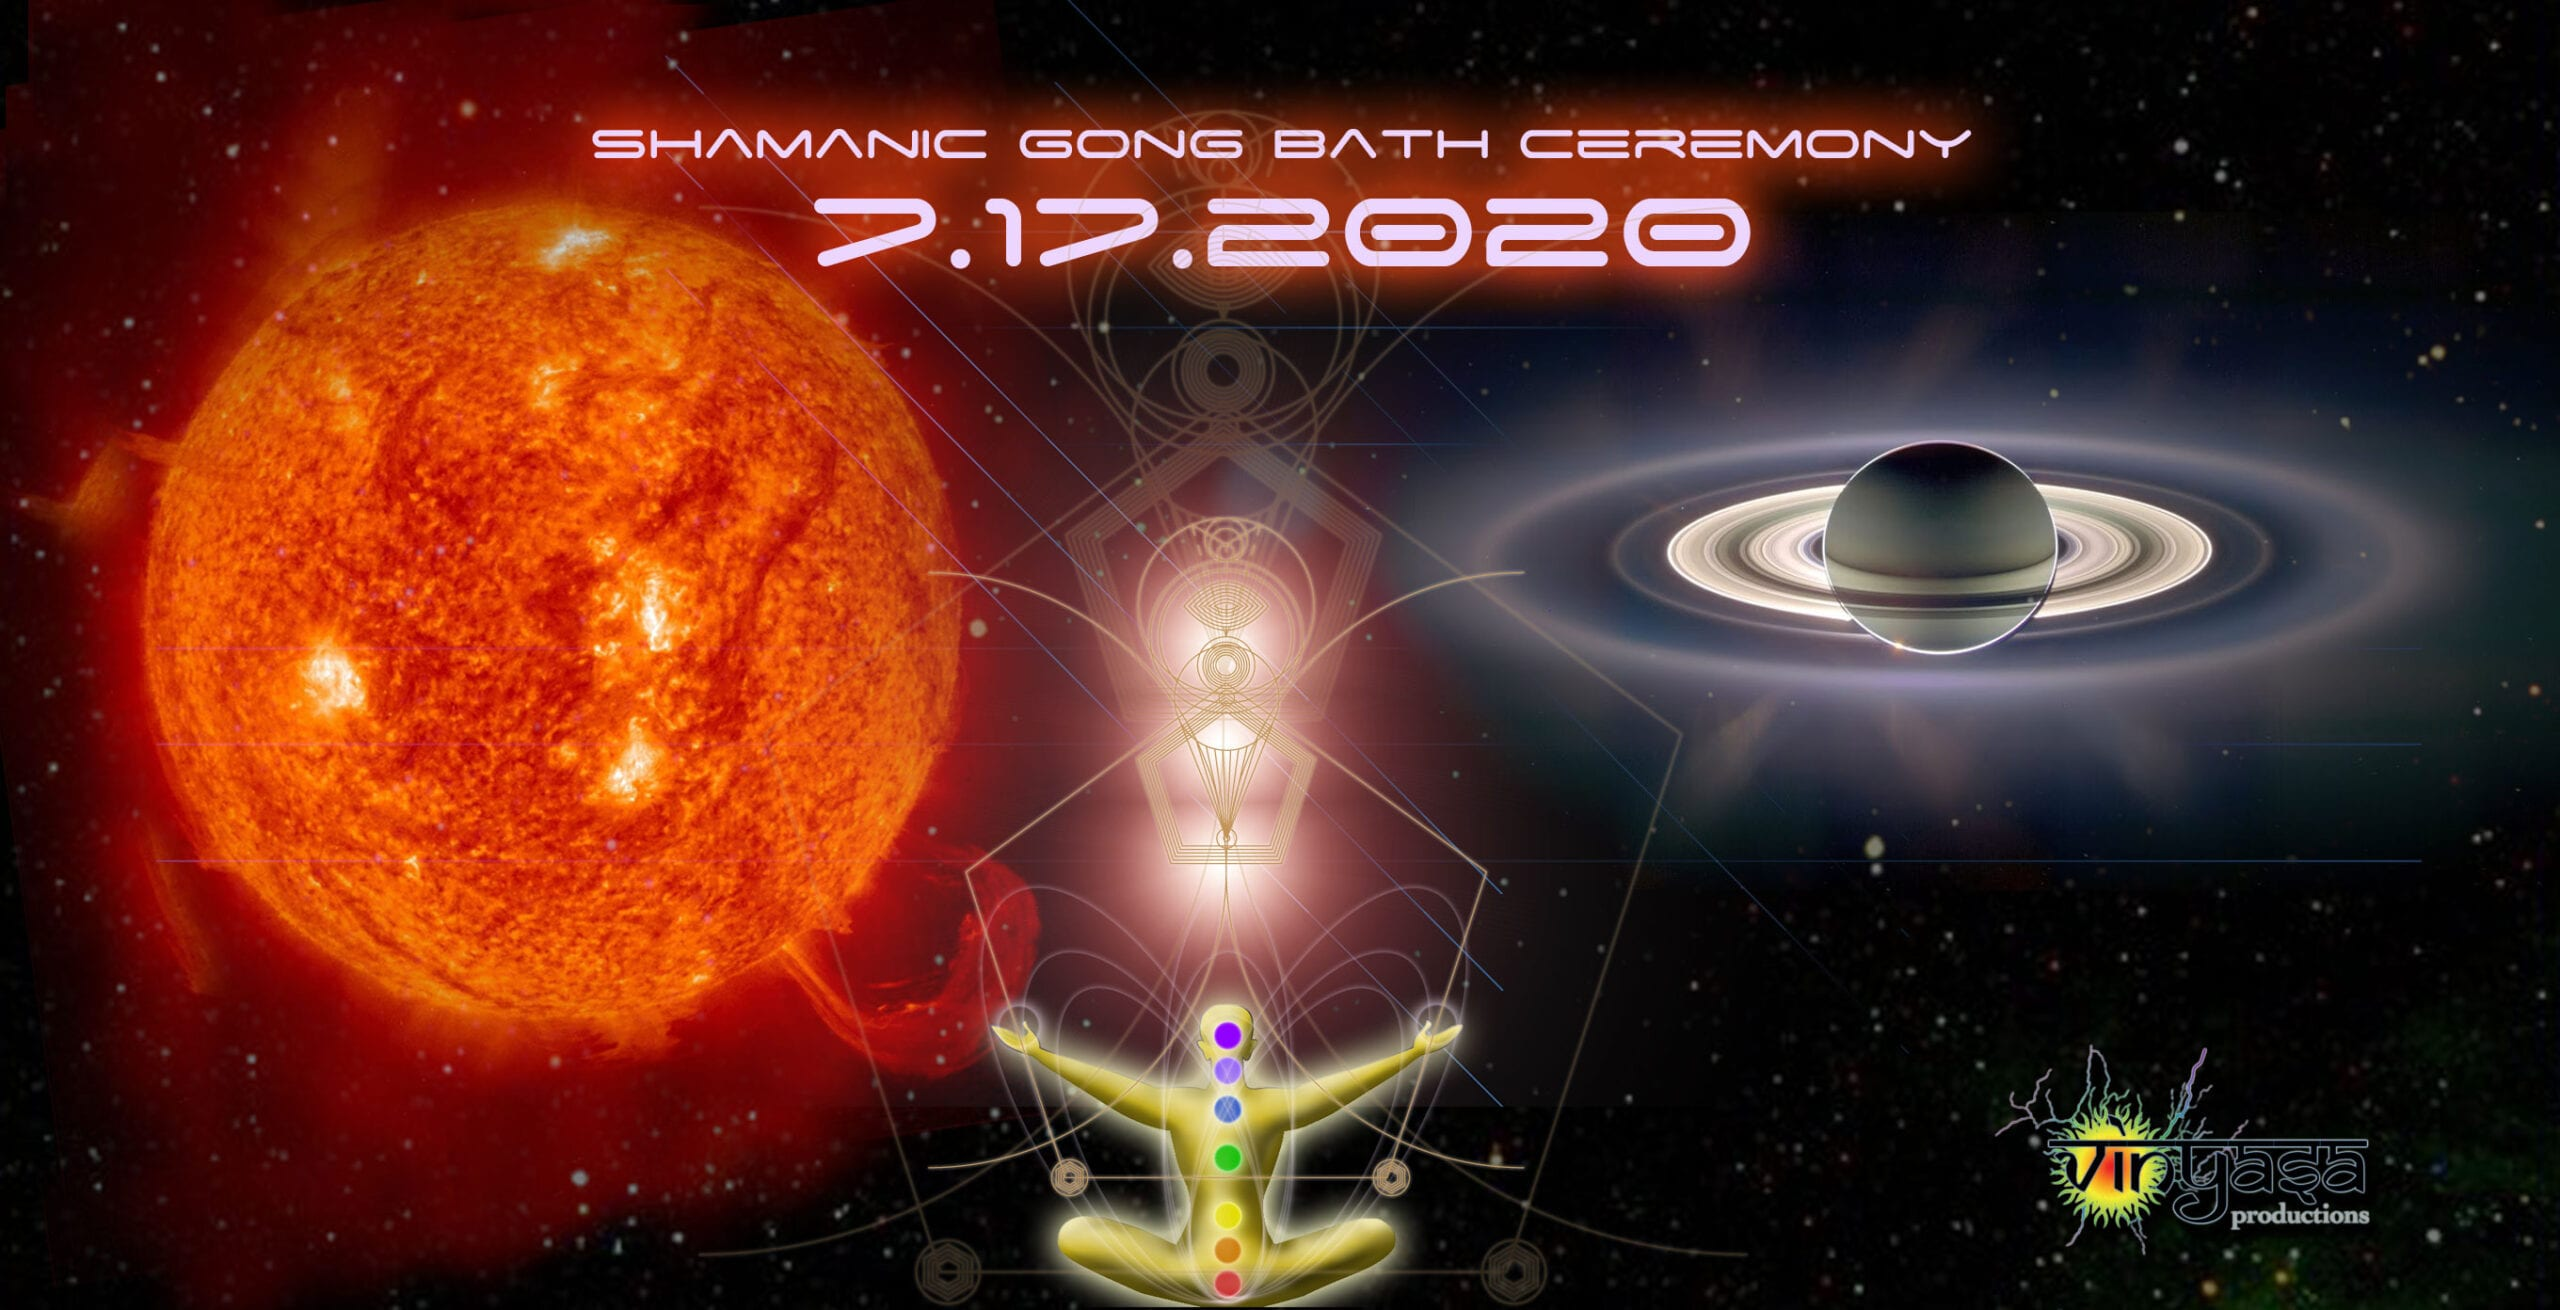 July 17, 2020 Gong Bath